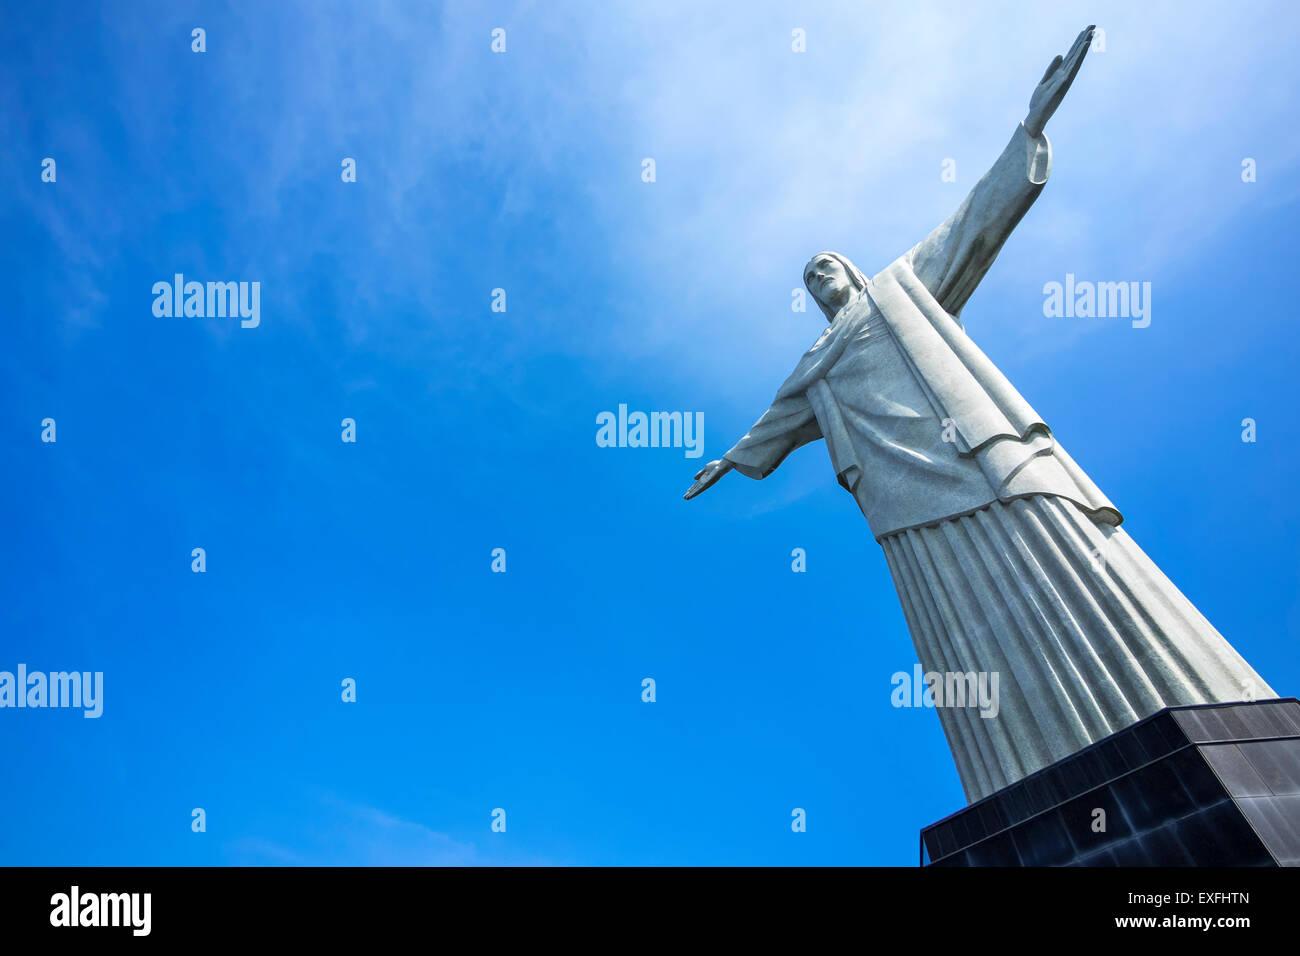 Christ the Redeemer statue in Rio de Janeiro, Brazil. - Stock Image